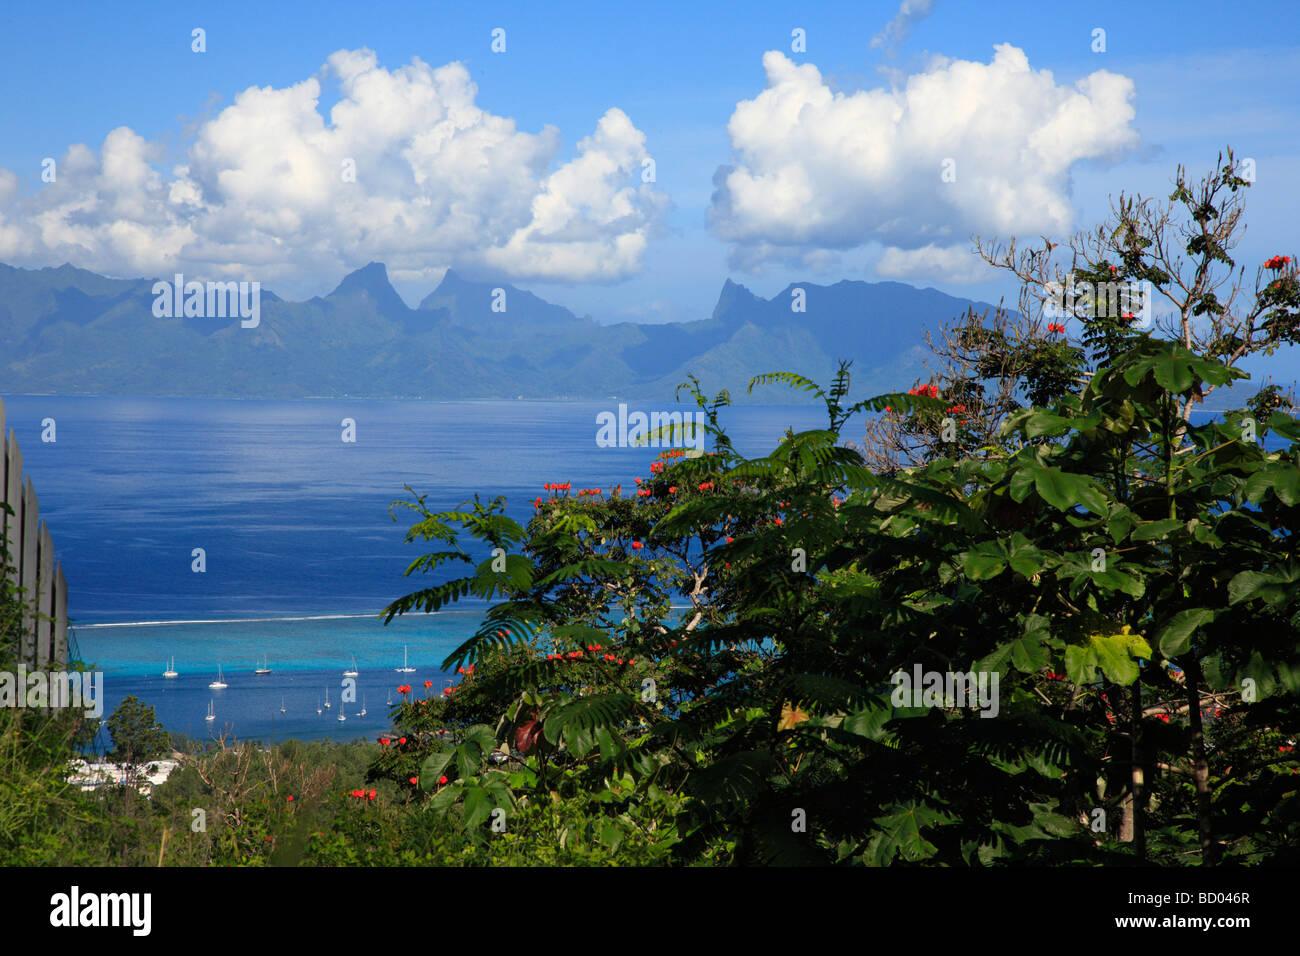 Moorea view from Tahiti, French Polynesia - Stock Image